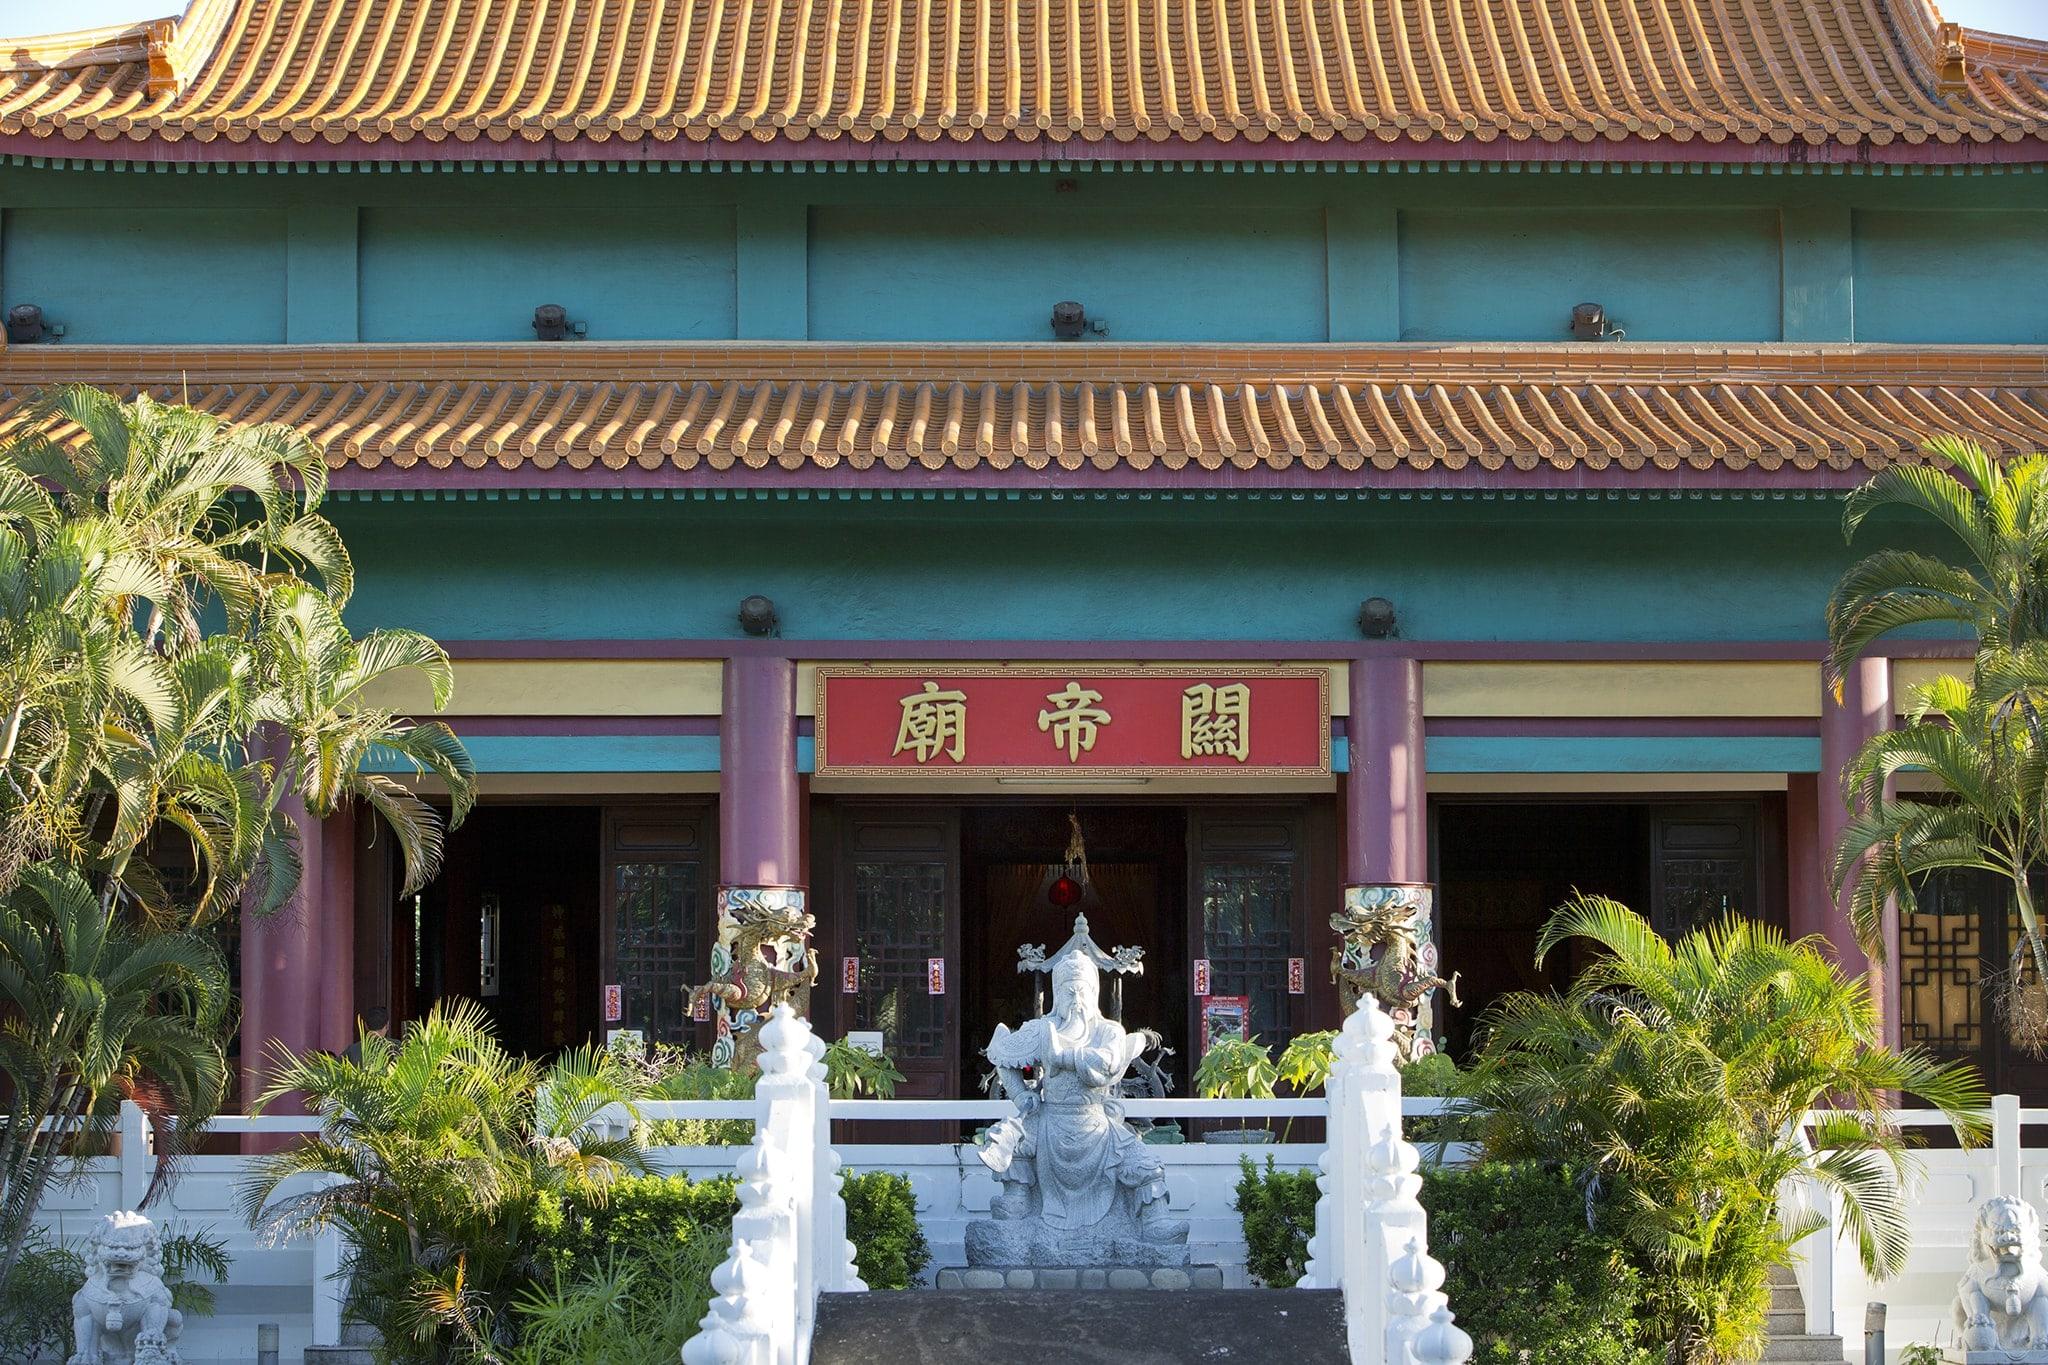 Temple chinois en Polynésie